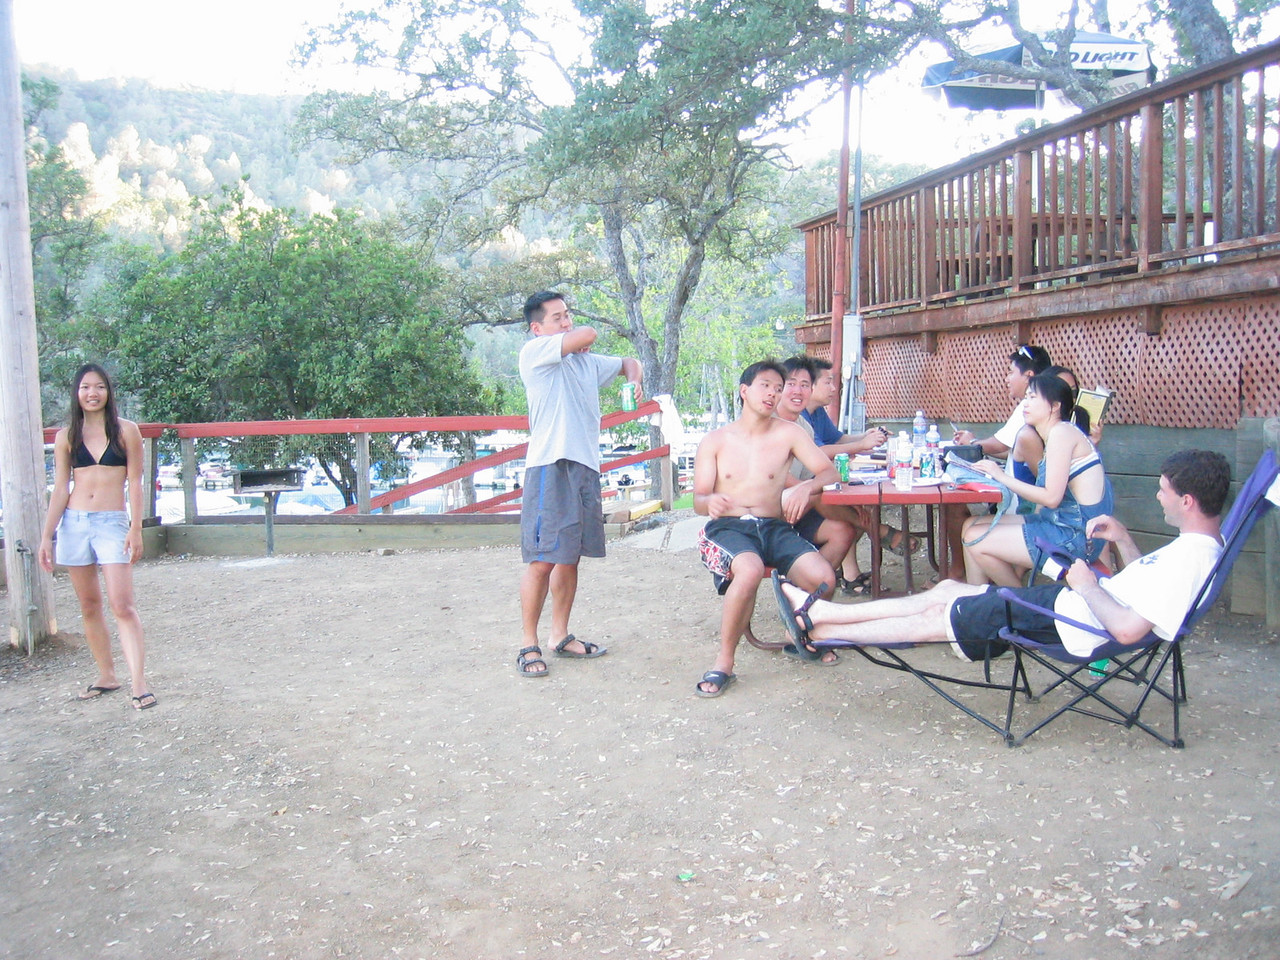 2003 08 16 Saturday - Lake Berryessa Trip, Mingling around picnic area